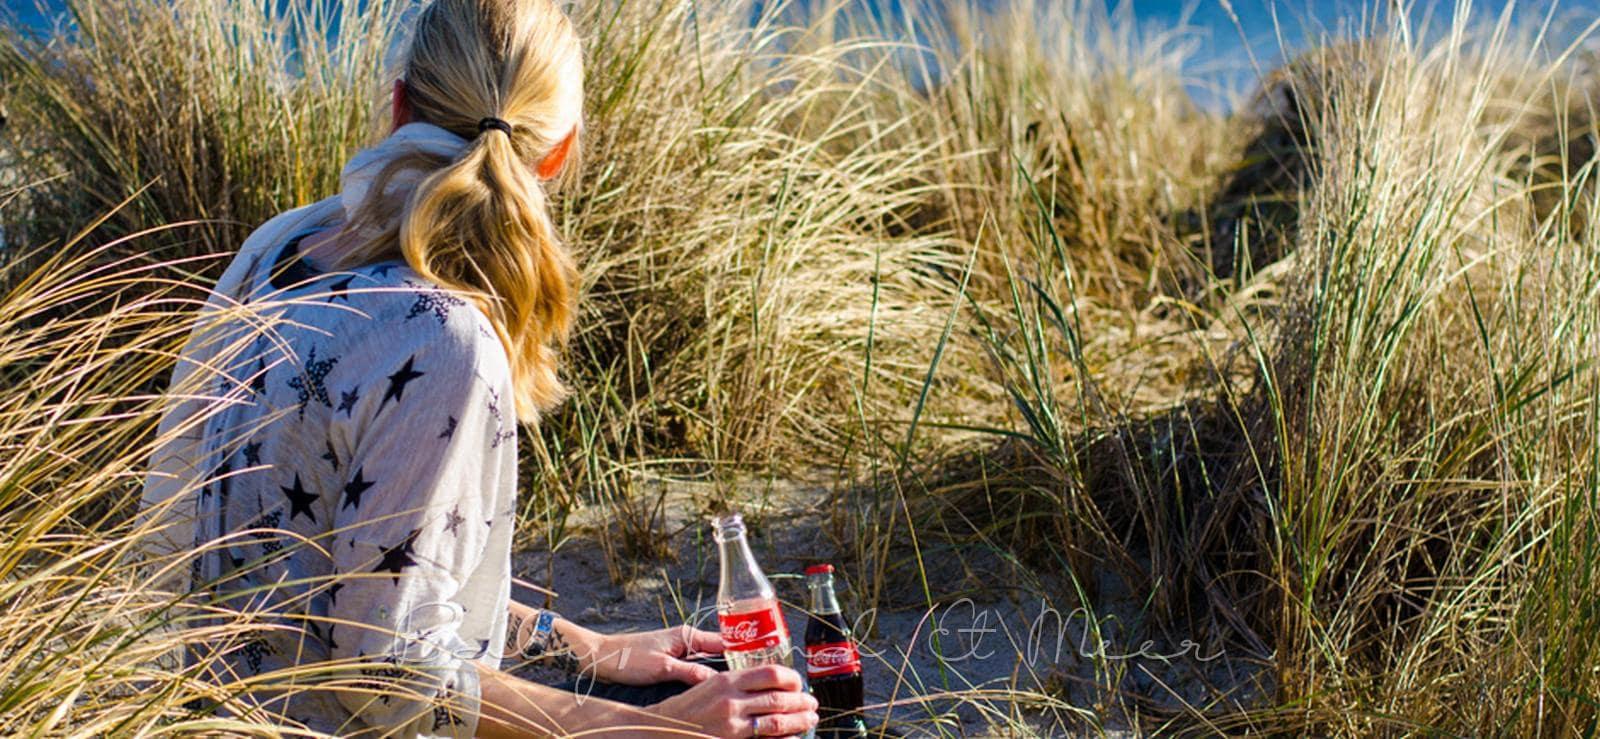 Coca Cola Tastethefeeling